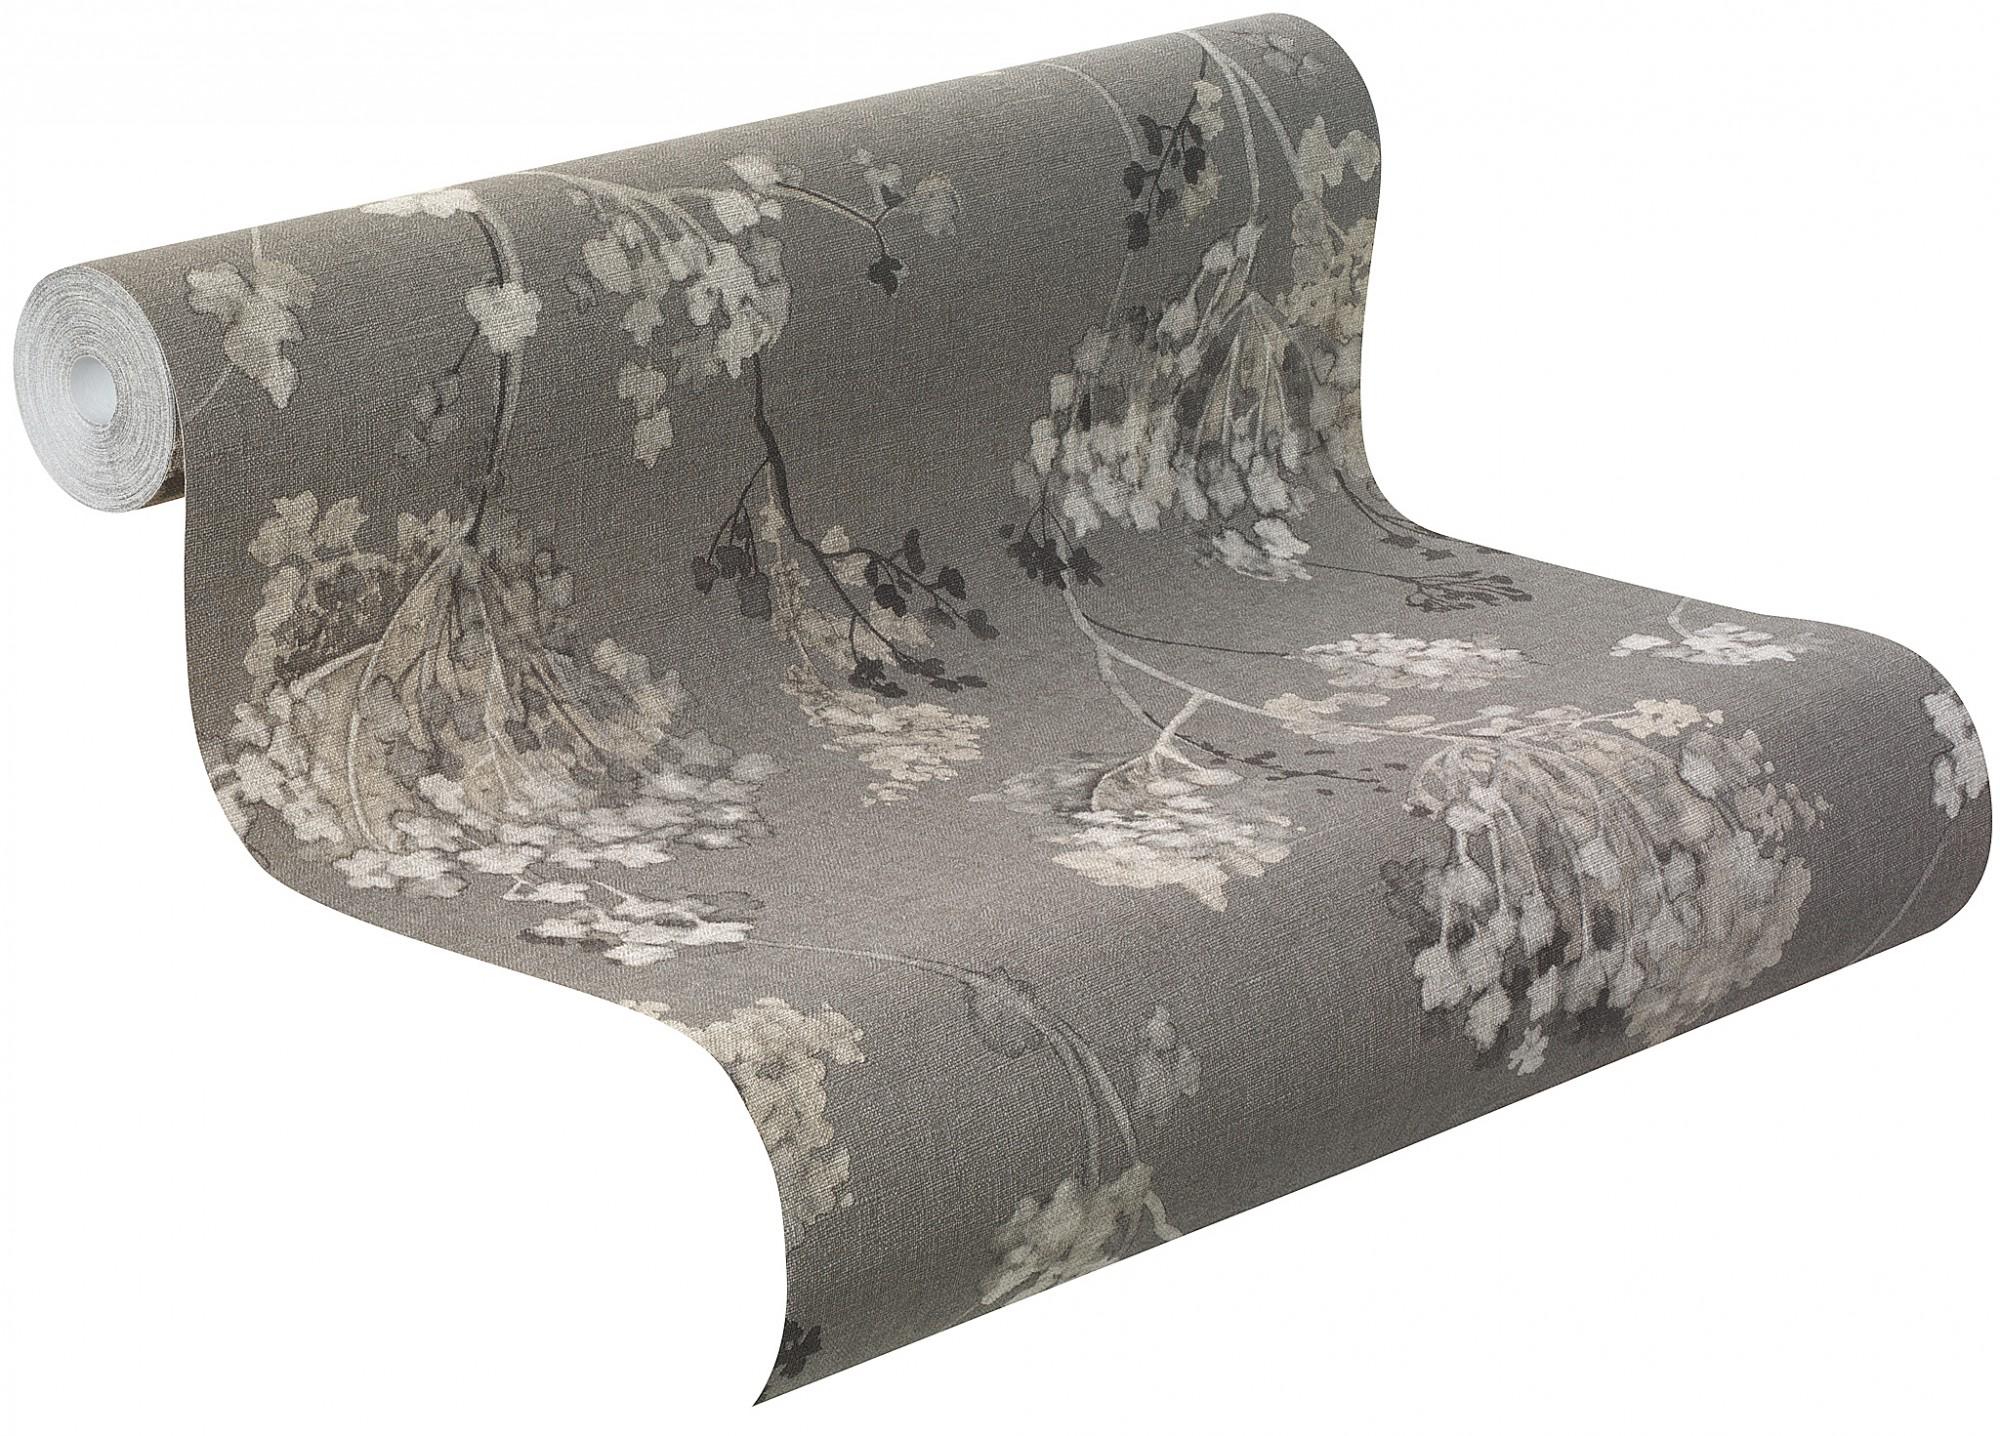 rasch tapete florentine floral schwarz grau 449242. Black Bedroom Furniture Sets. Home Design Ideas